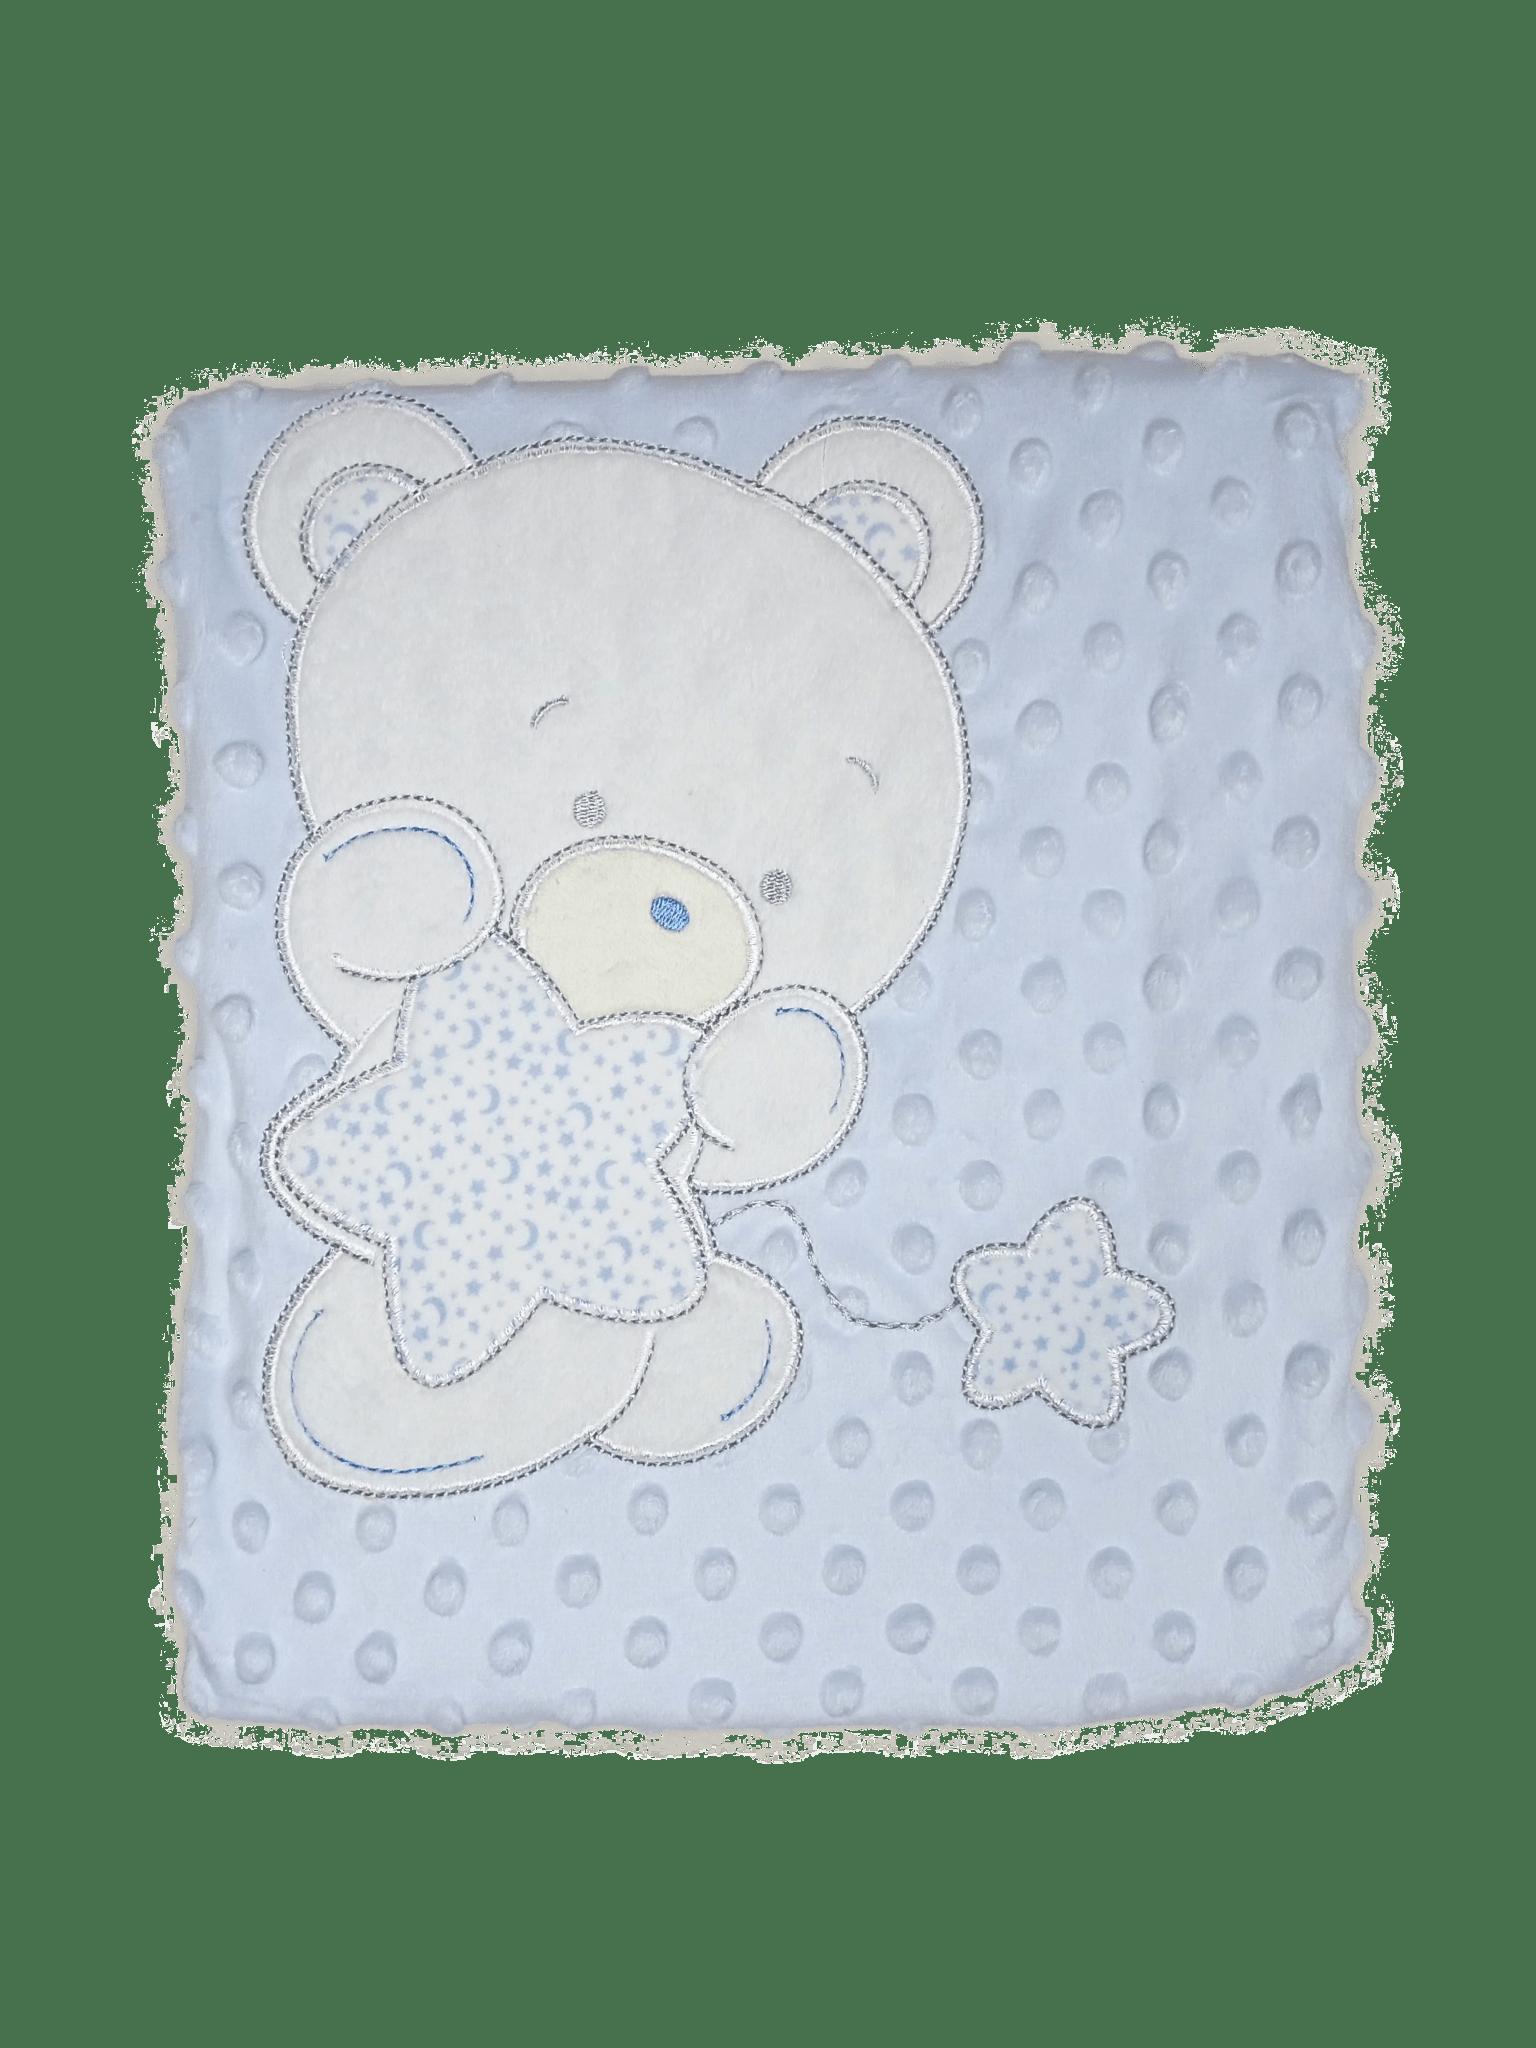 CarterLiebe Fleece Wrapping Shawl